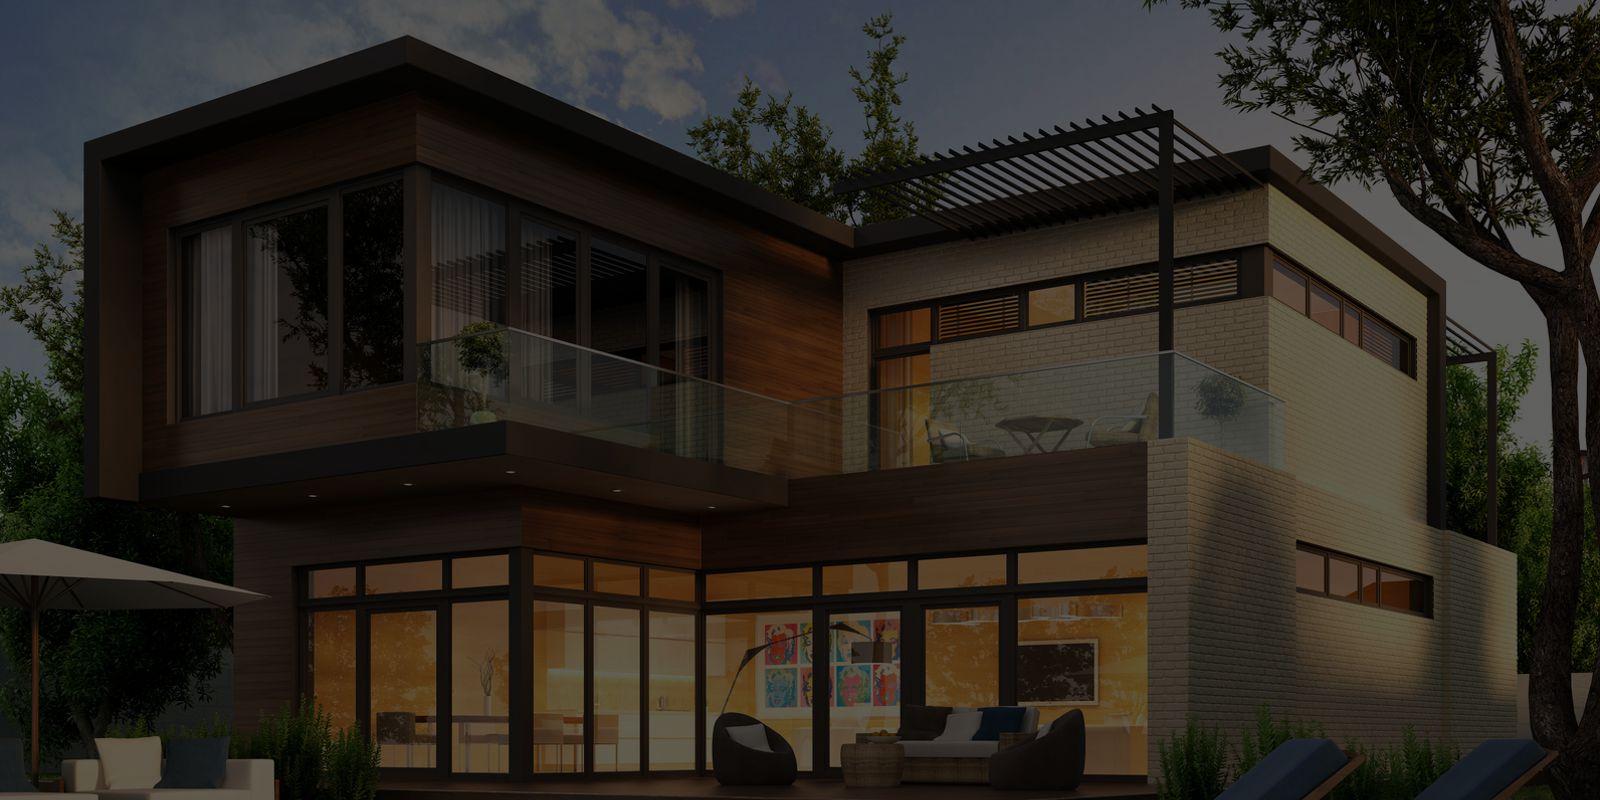 domy-kontenerowe-tlo